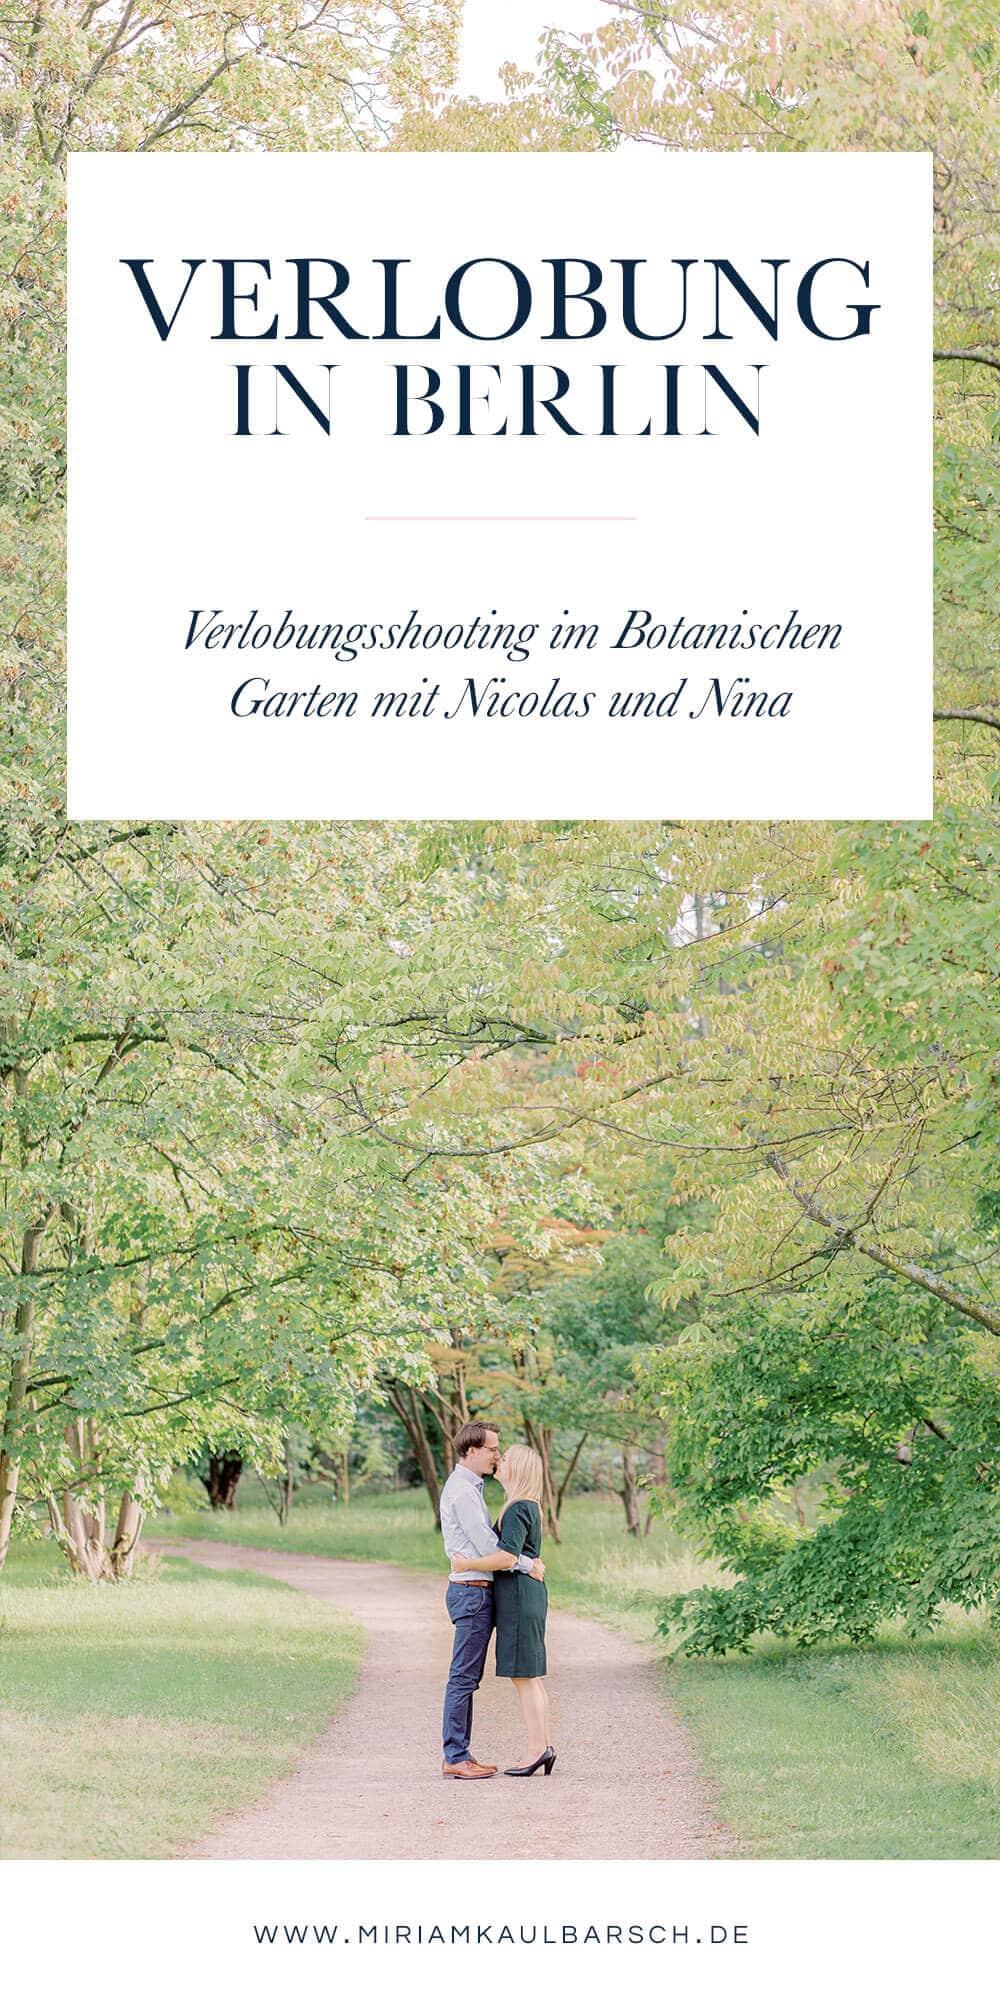 Verlobung in Berlin - Romantische Verlobungsfotos im Berliner Süden mit Nina und Nicolas